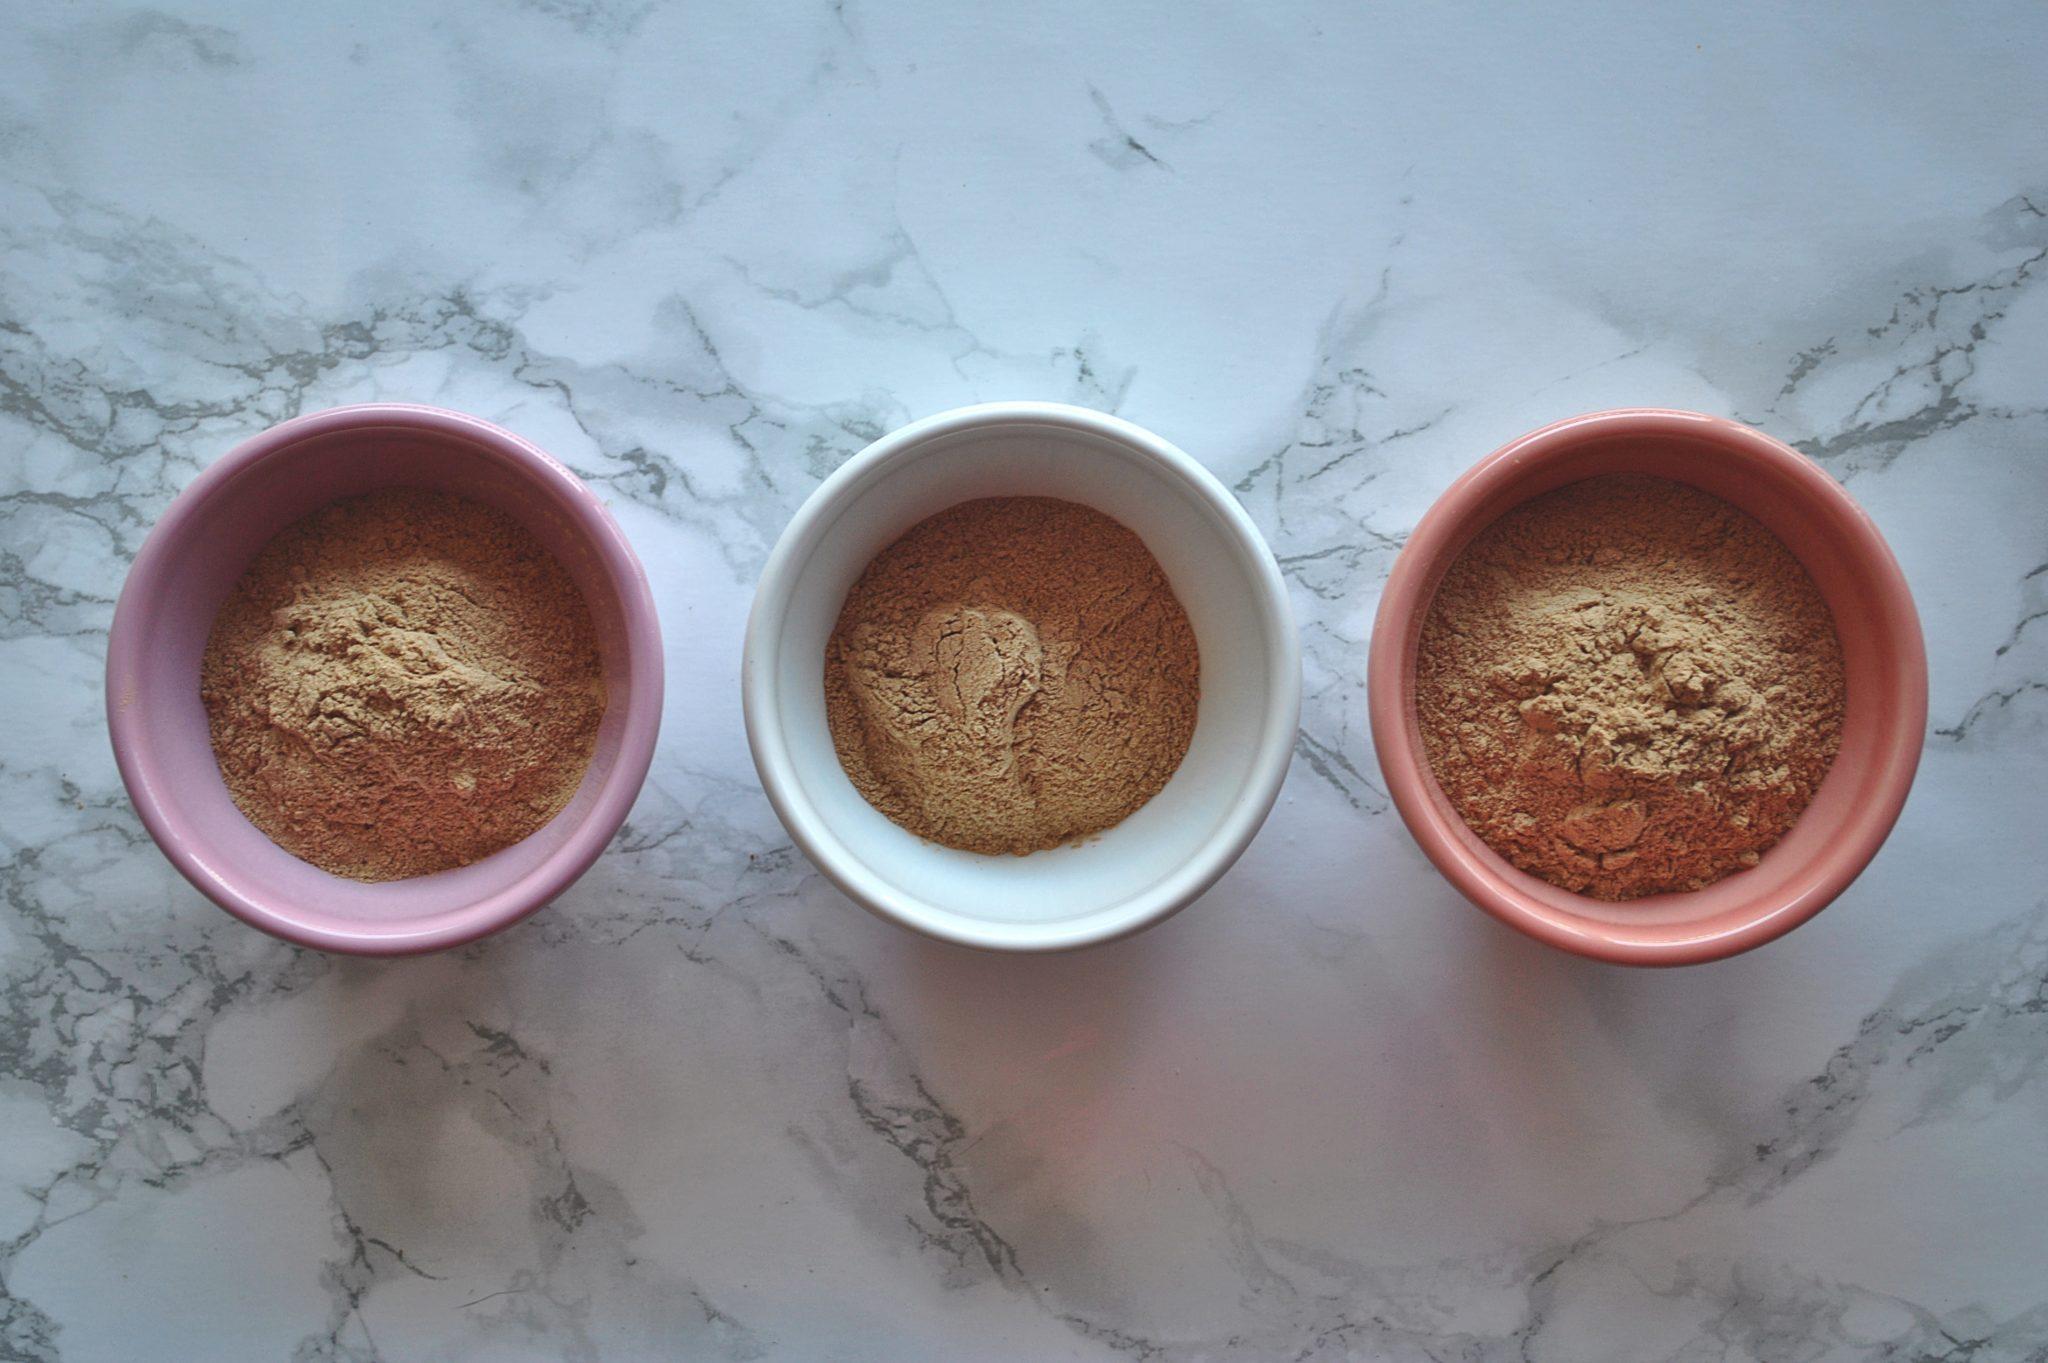 The-Hungarian-Brunette-Maca-Powder-Benefits.jpg